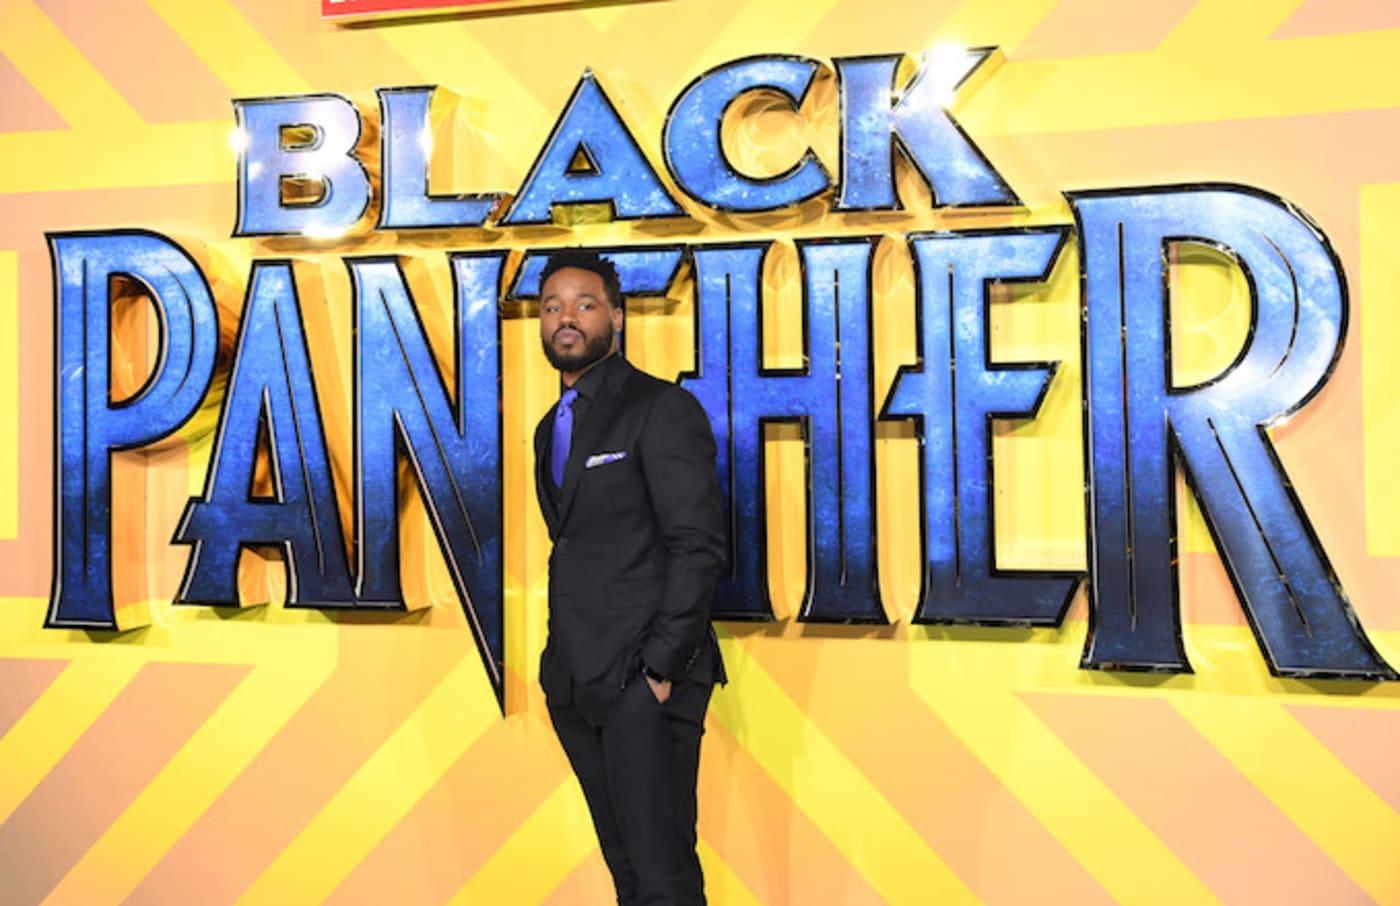 Ryan Coogler at a 'Black Panther' premiere.